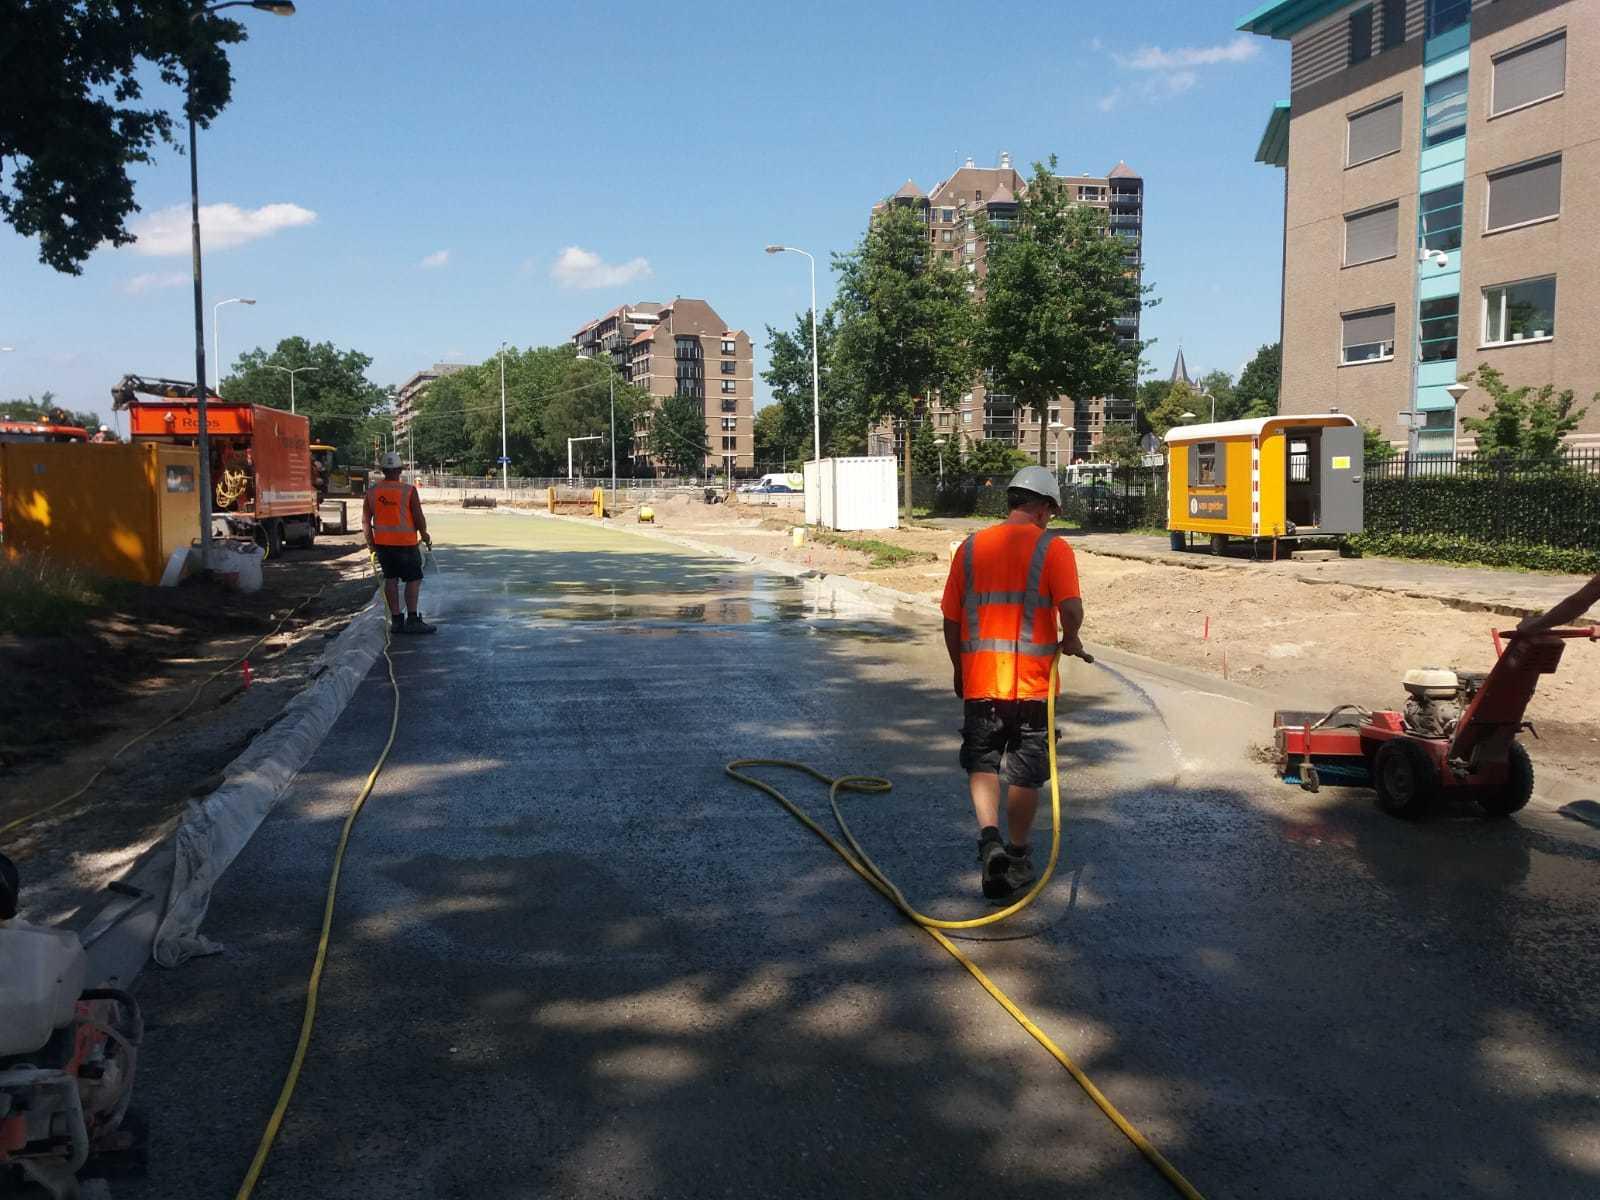 Uitgewassen betonverharding in Eindhoven